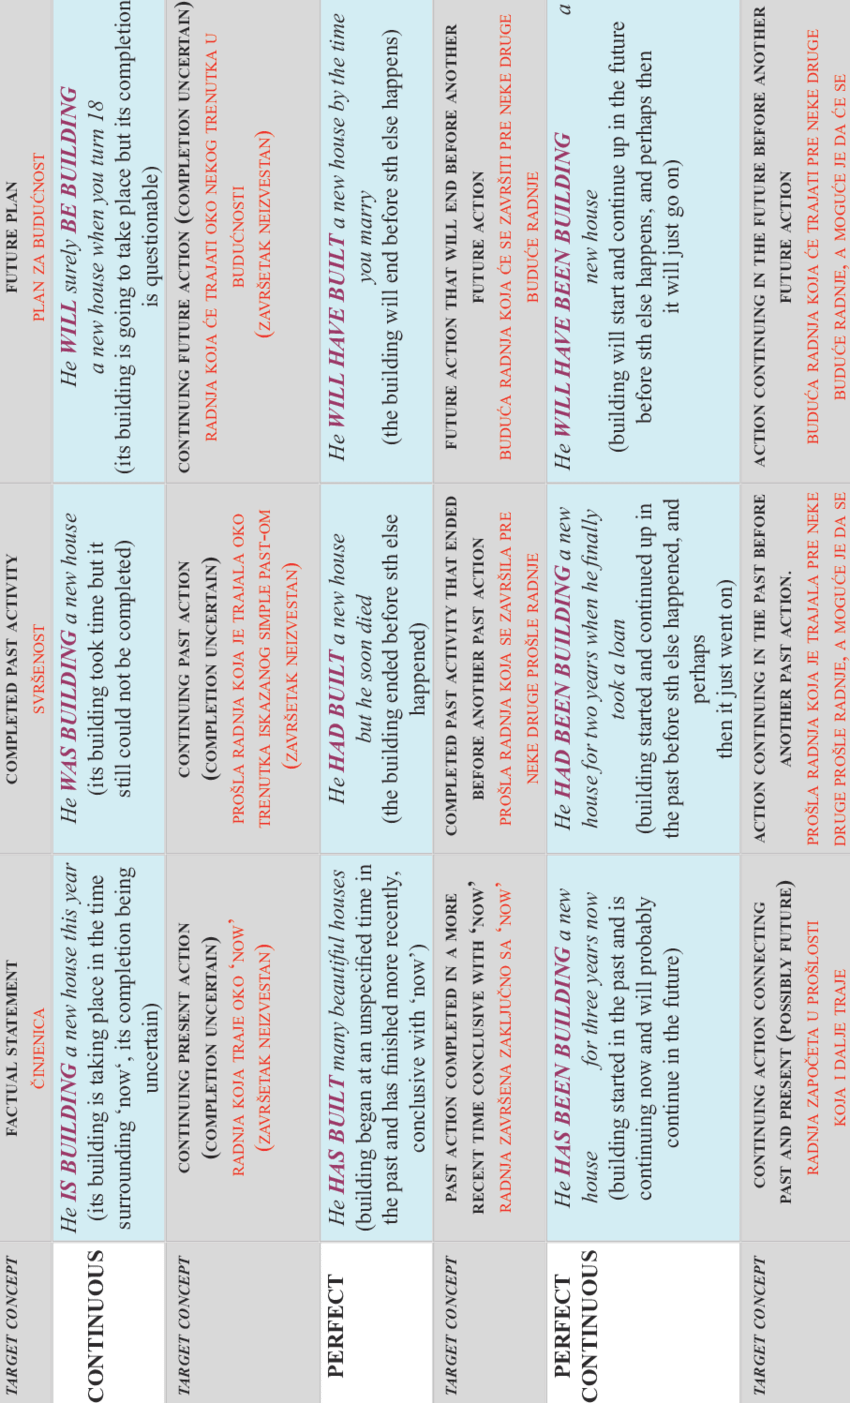 active verb tenses chart